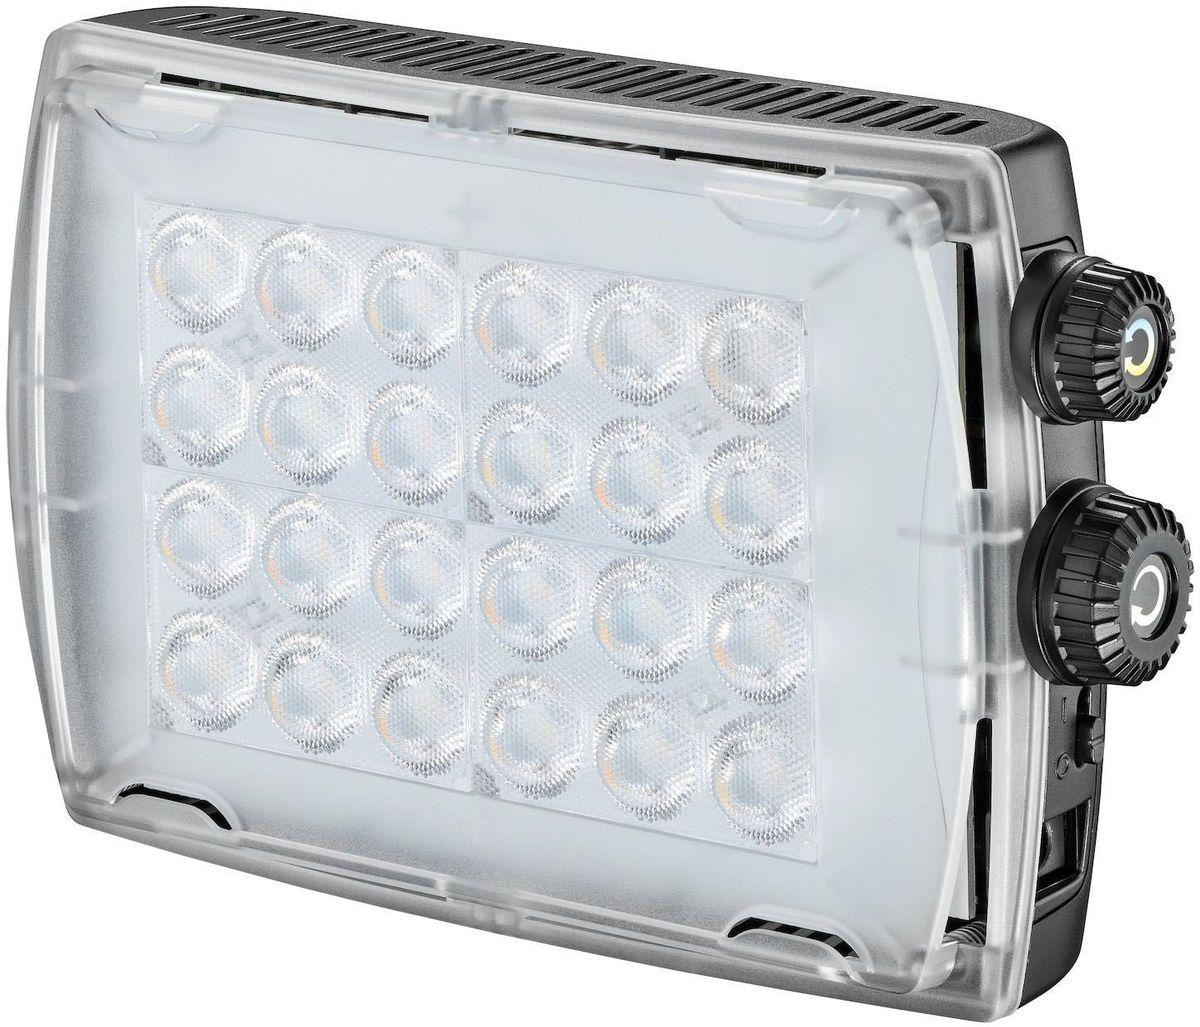 Manfrotto MLCROMA2, Black свет для фотостудии